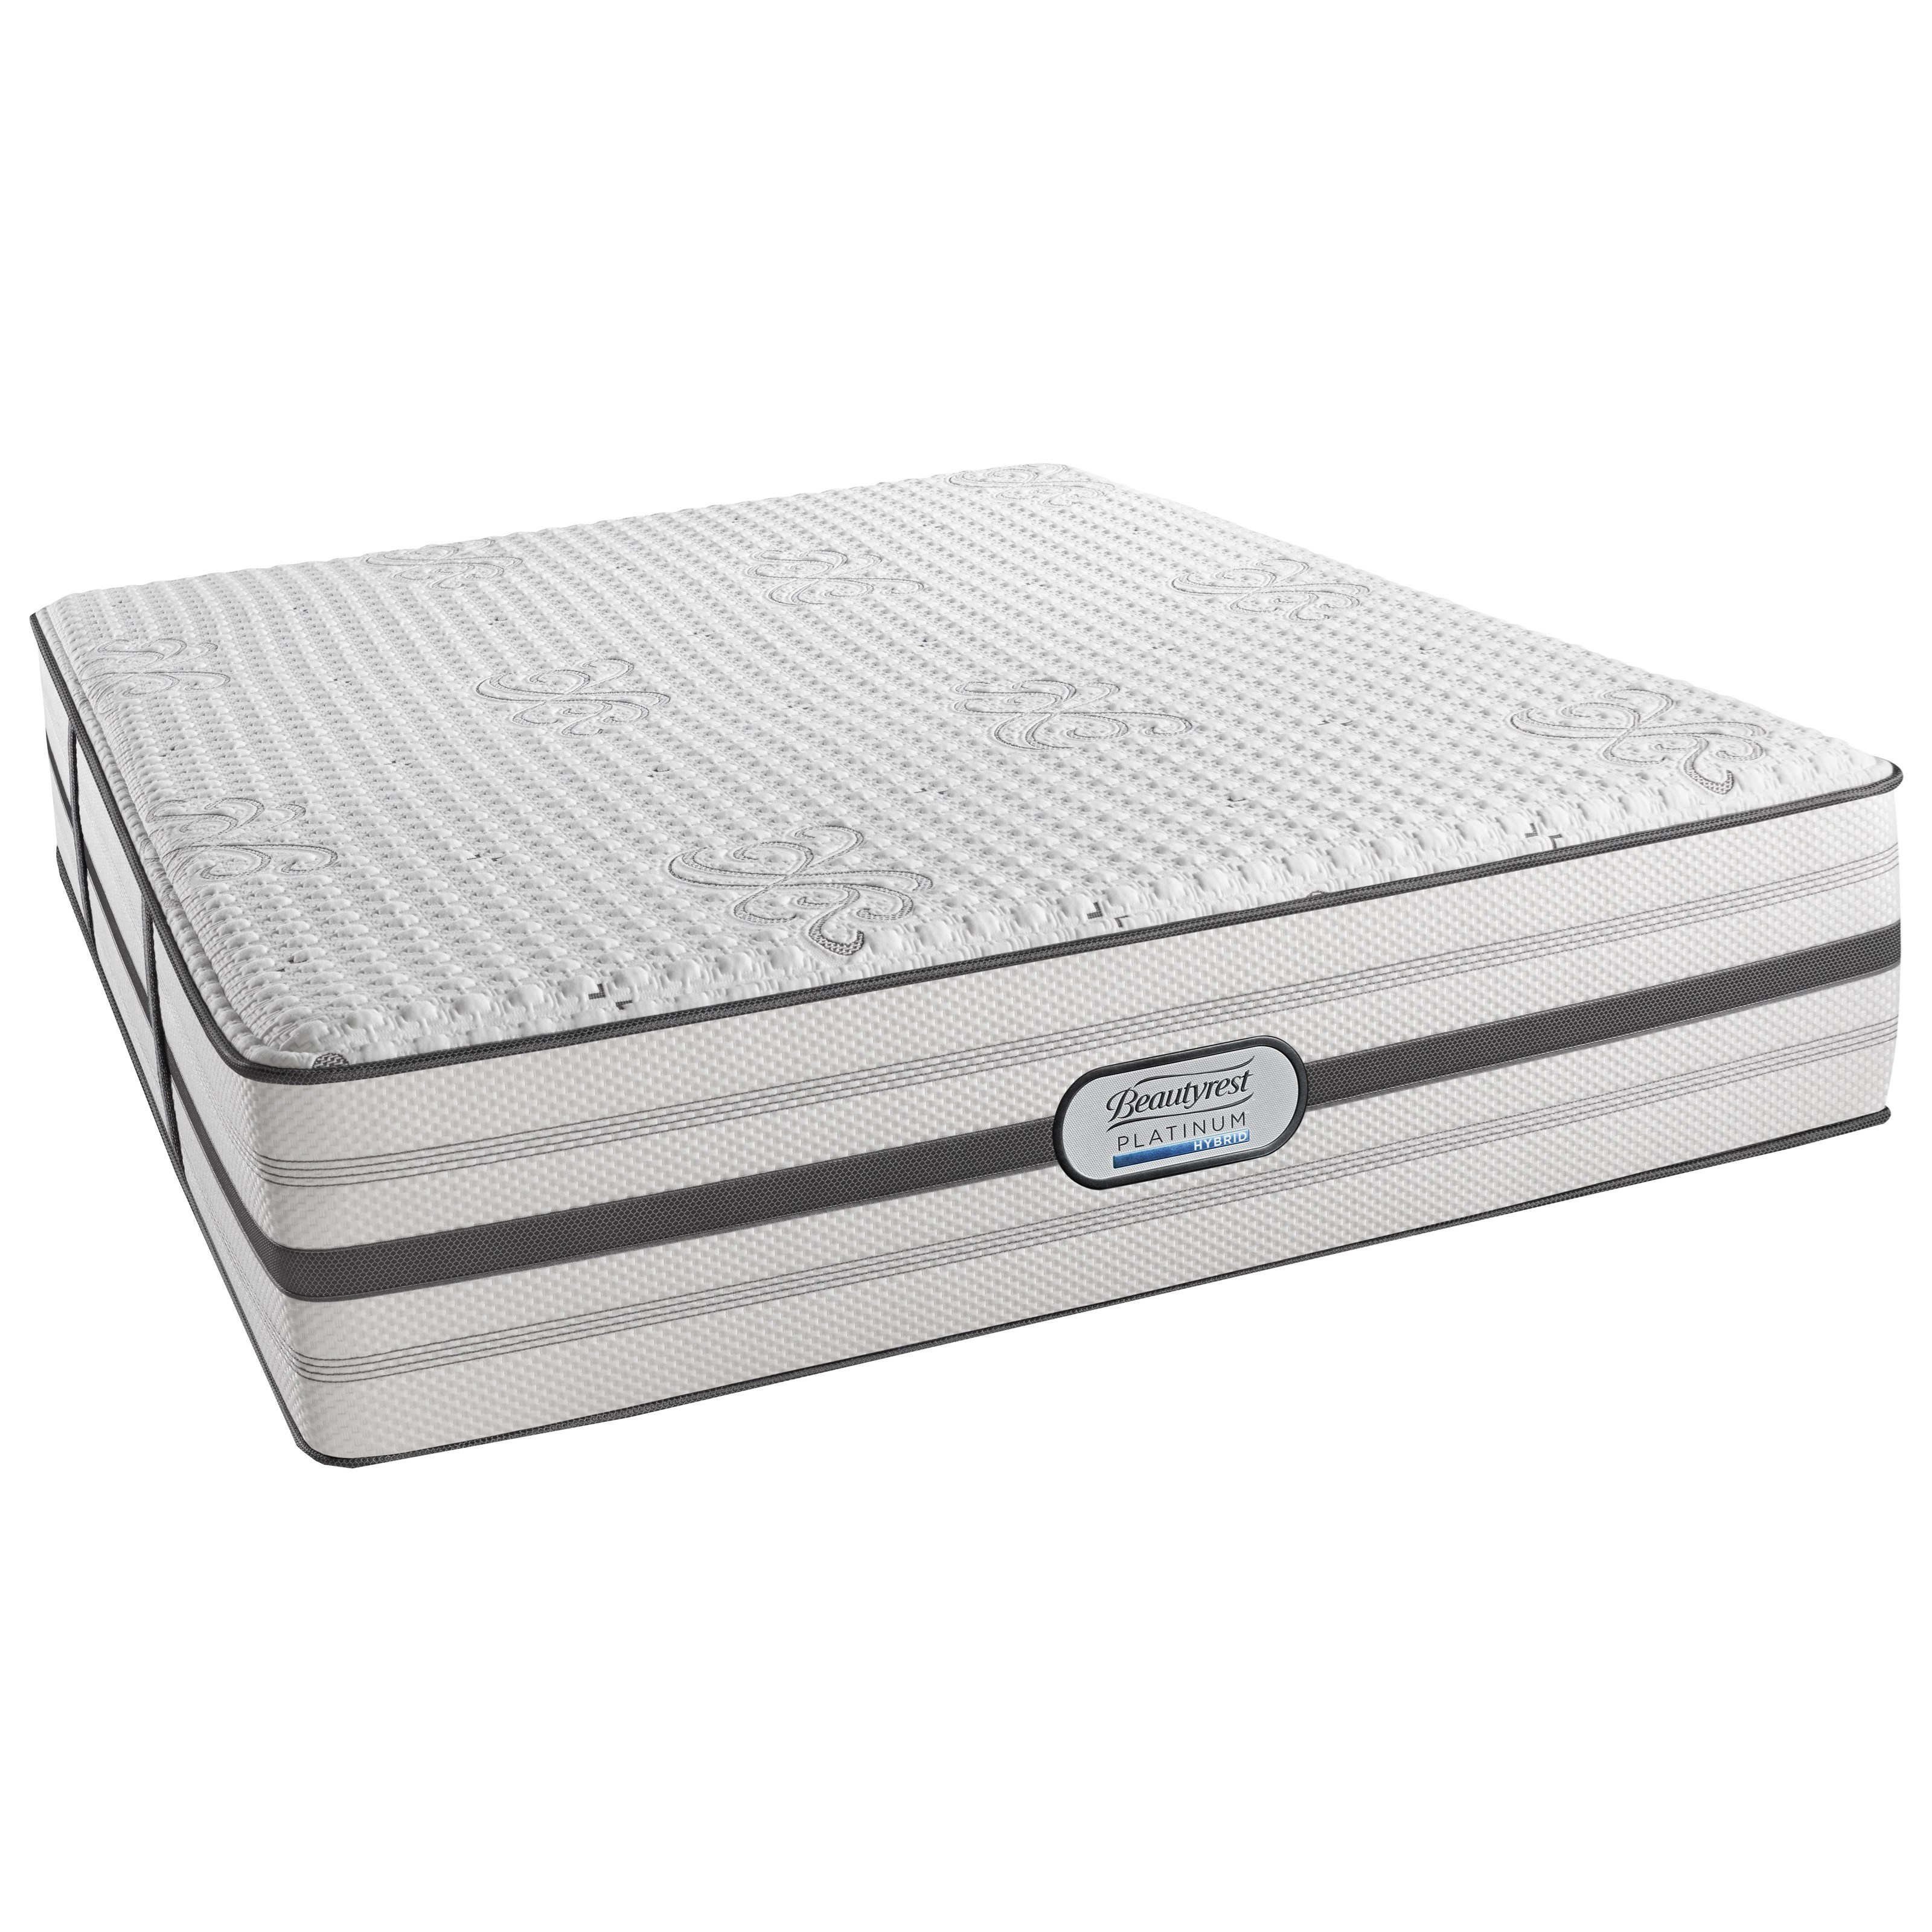 Beautyrest Platinum Austin King Luxury Firm Adjustable Set - Item Number: BRHLV1LF-K+2xSM1-TXLK